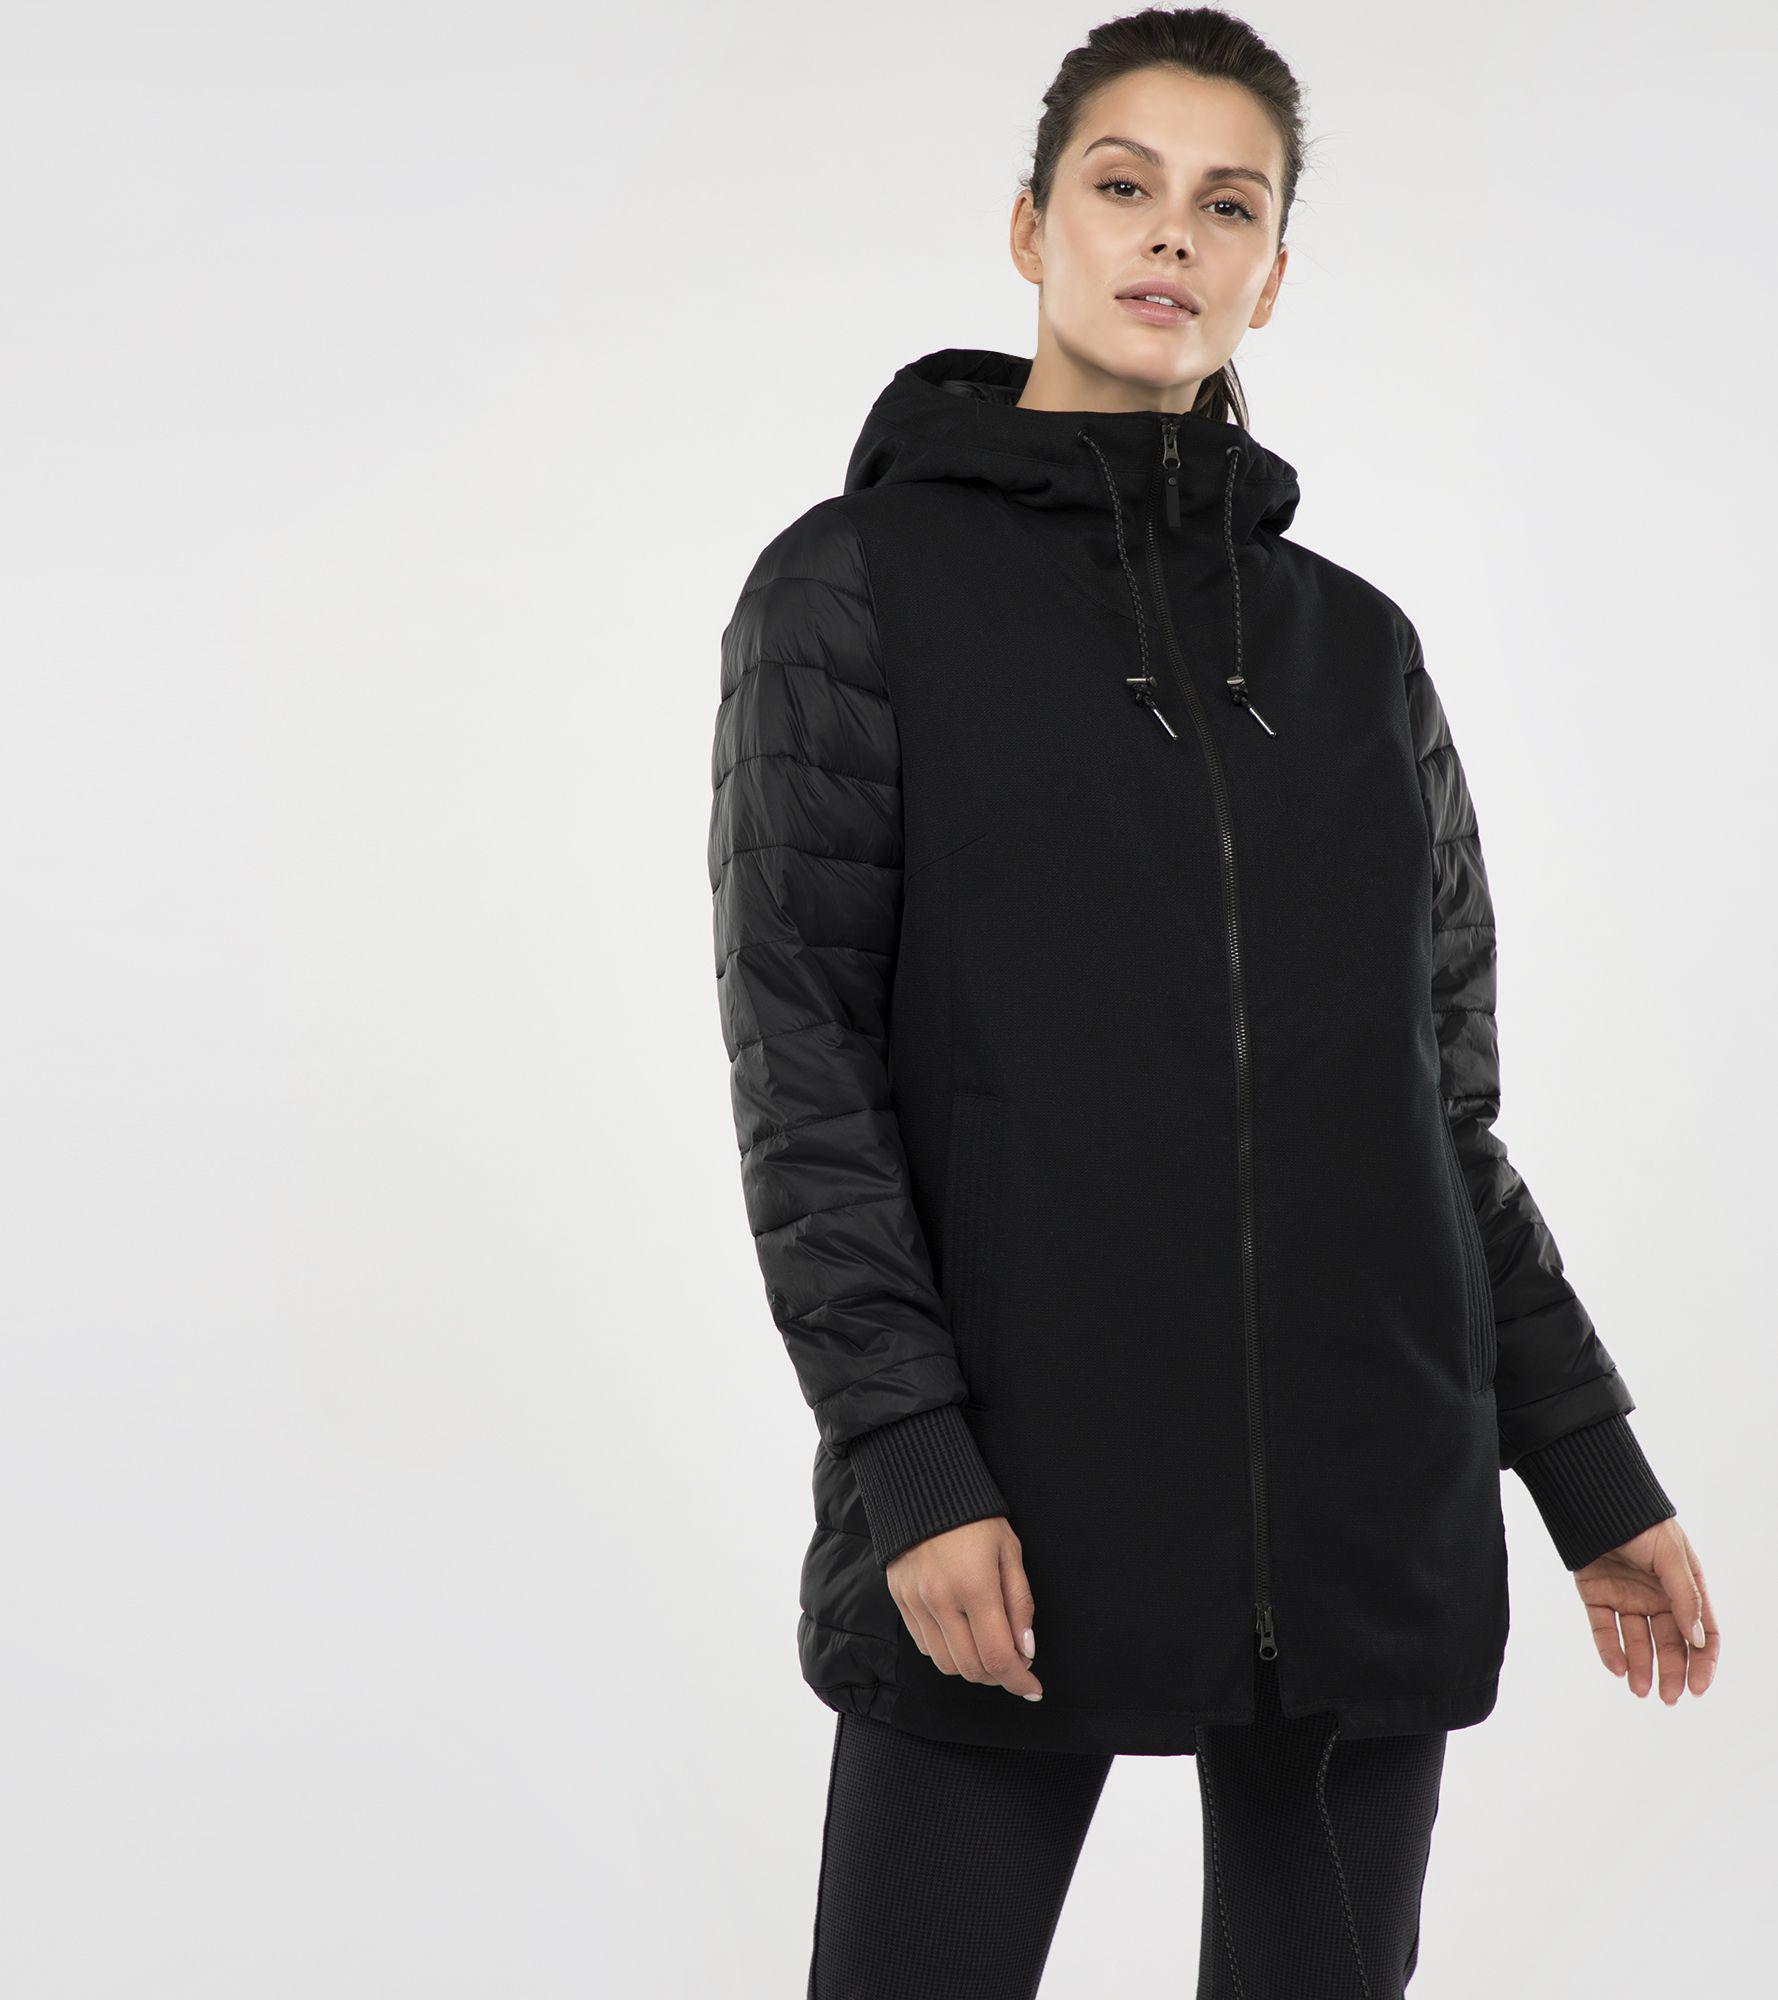 Columbia Куртка утепленная женская Columbia Boundary Bay, размер 50 columbia куртка утепленная женская columbia windgates размер 50